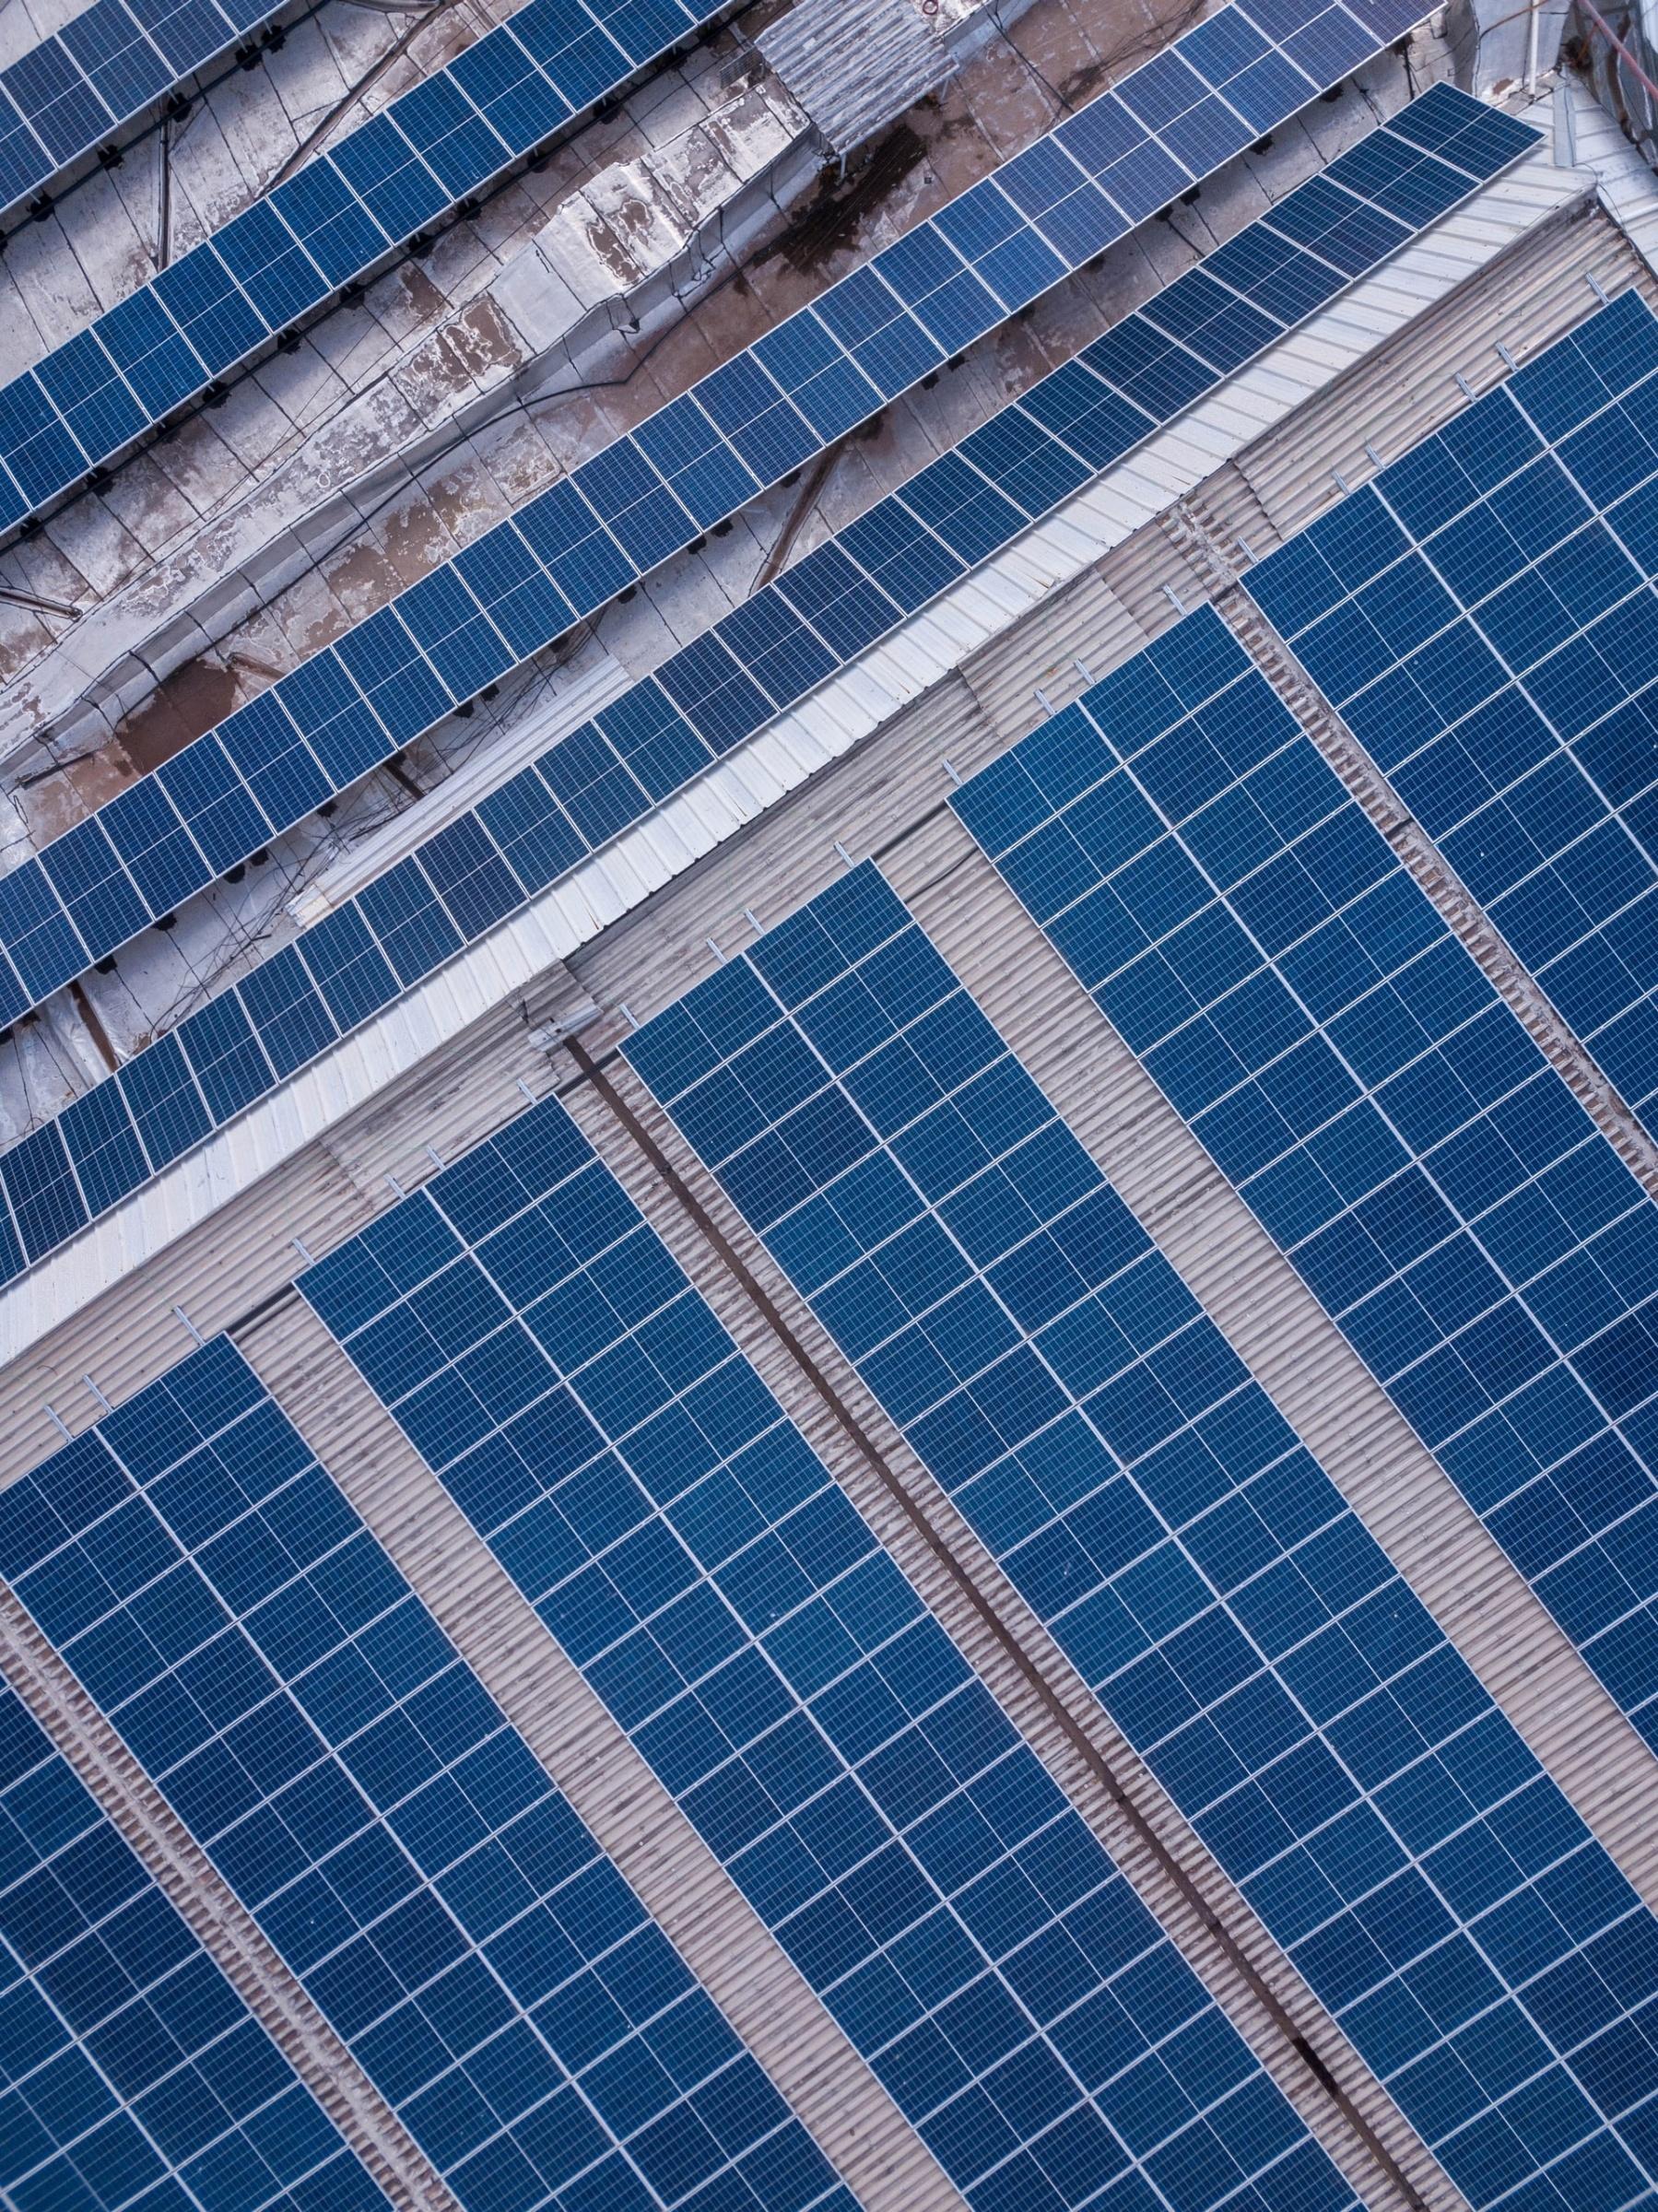 Rhode Island Solar, Solar Panels, Solar Power, Solar Energy, RI, YSG Solar